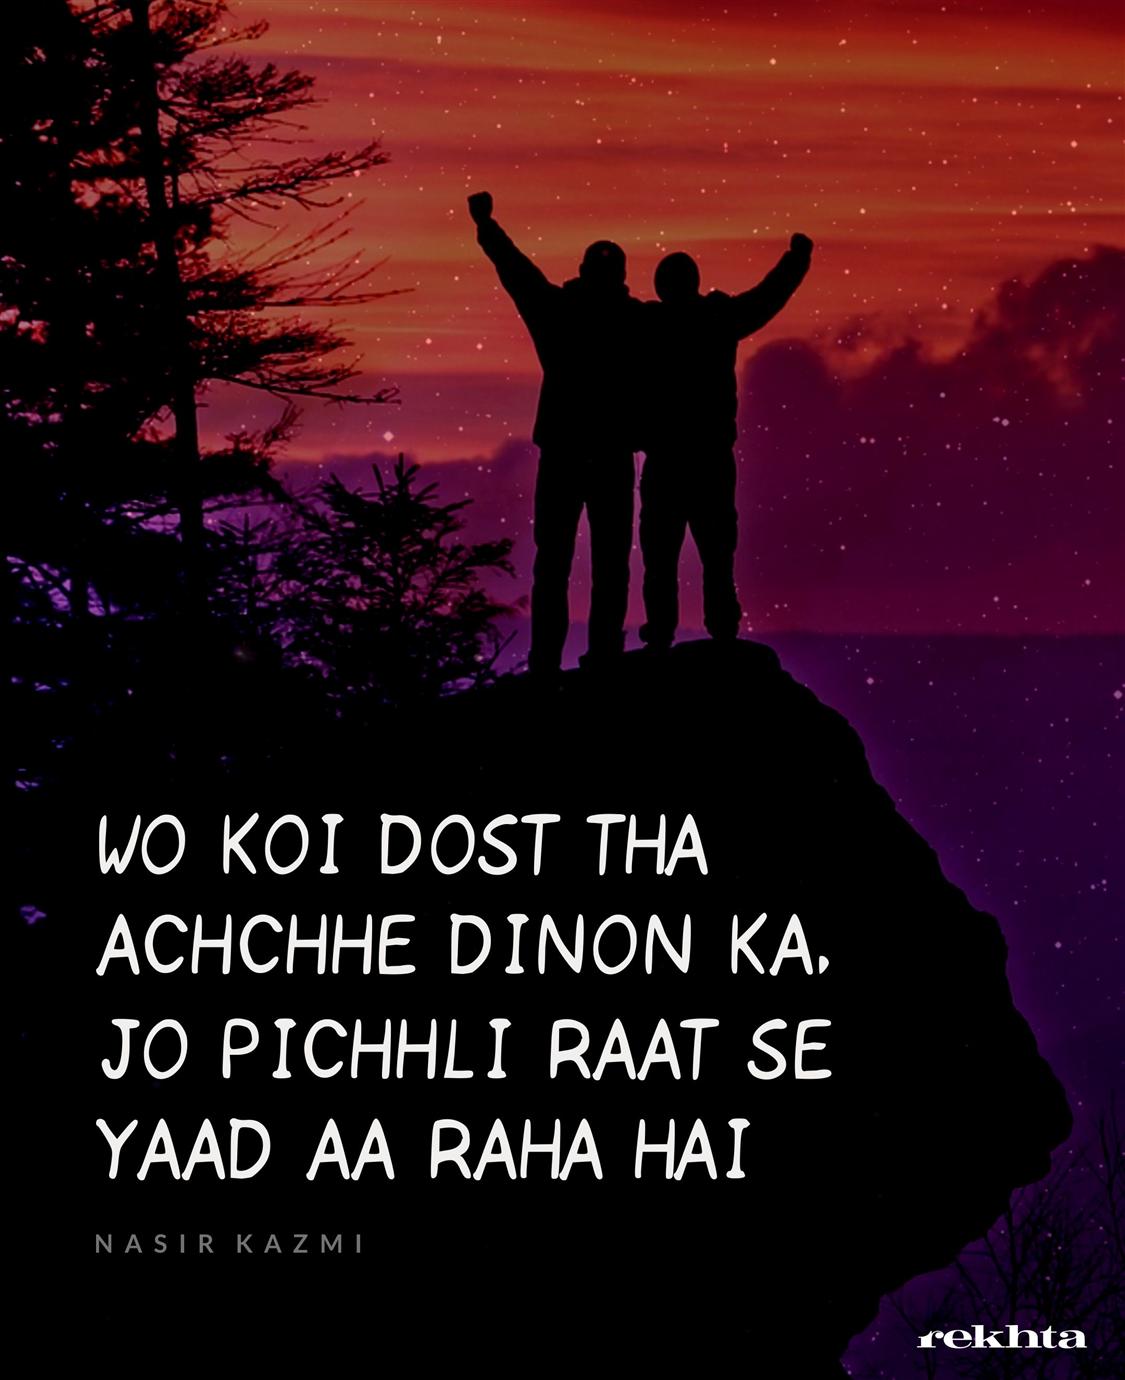 vo ko.ii dost thaa achchhe dino.n kaa-Nasir Kazmi